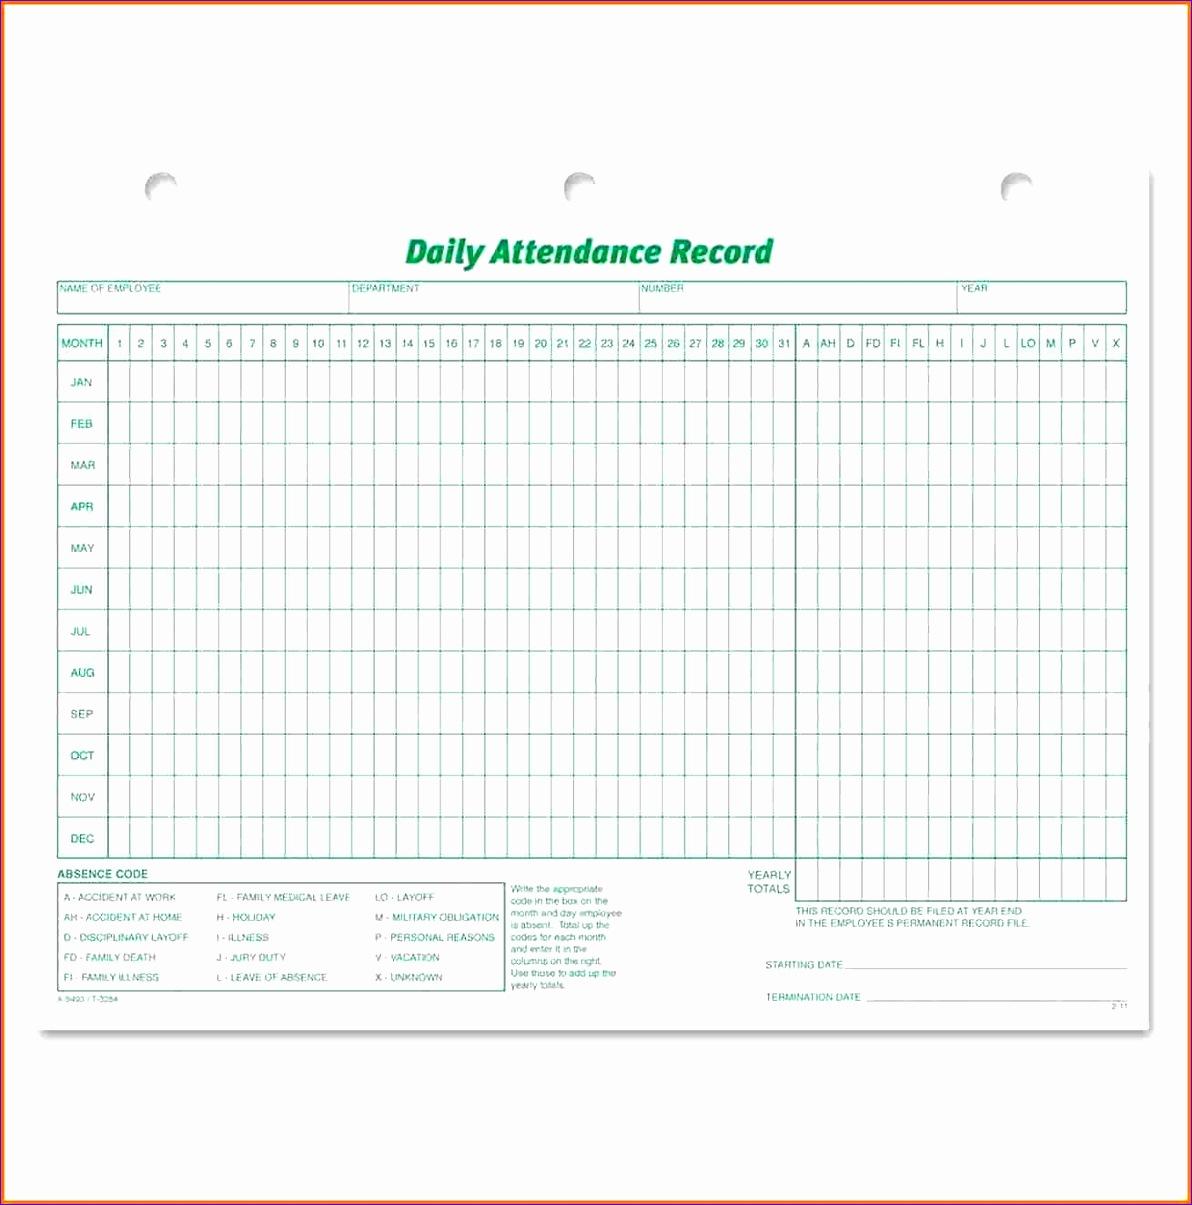 attendance record template 11921205